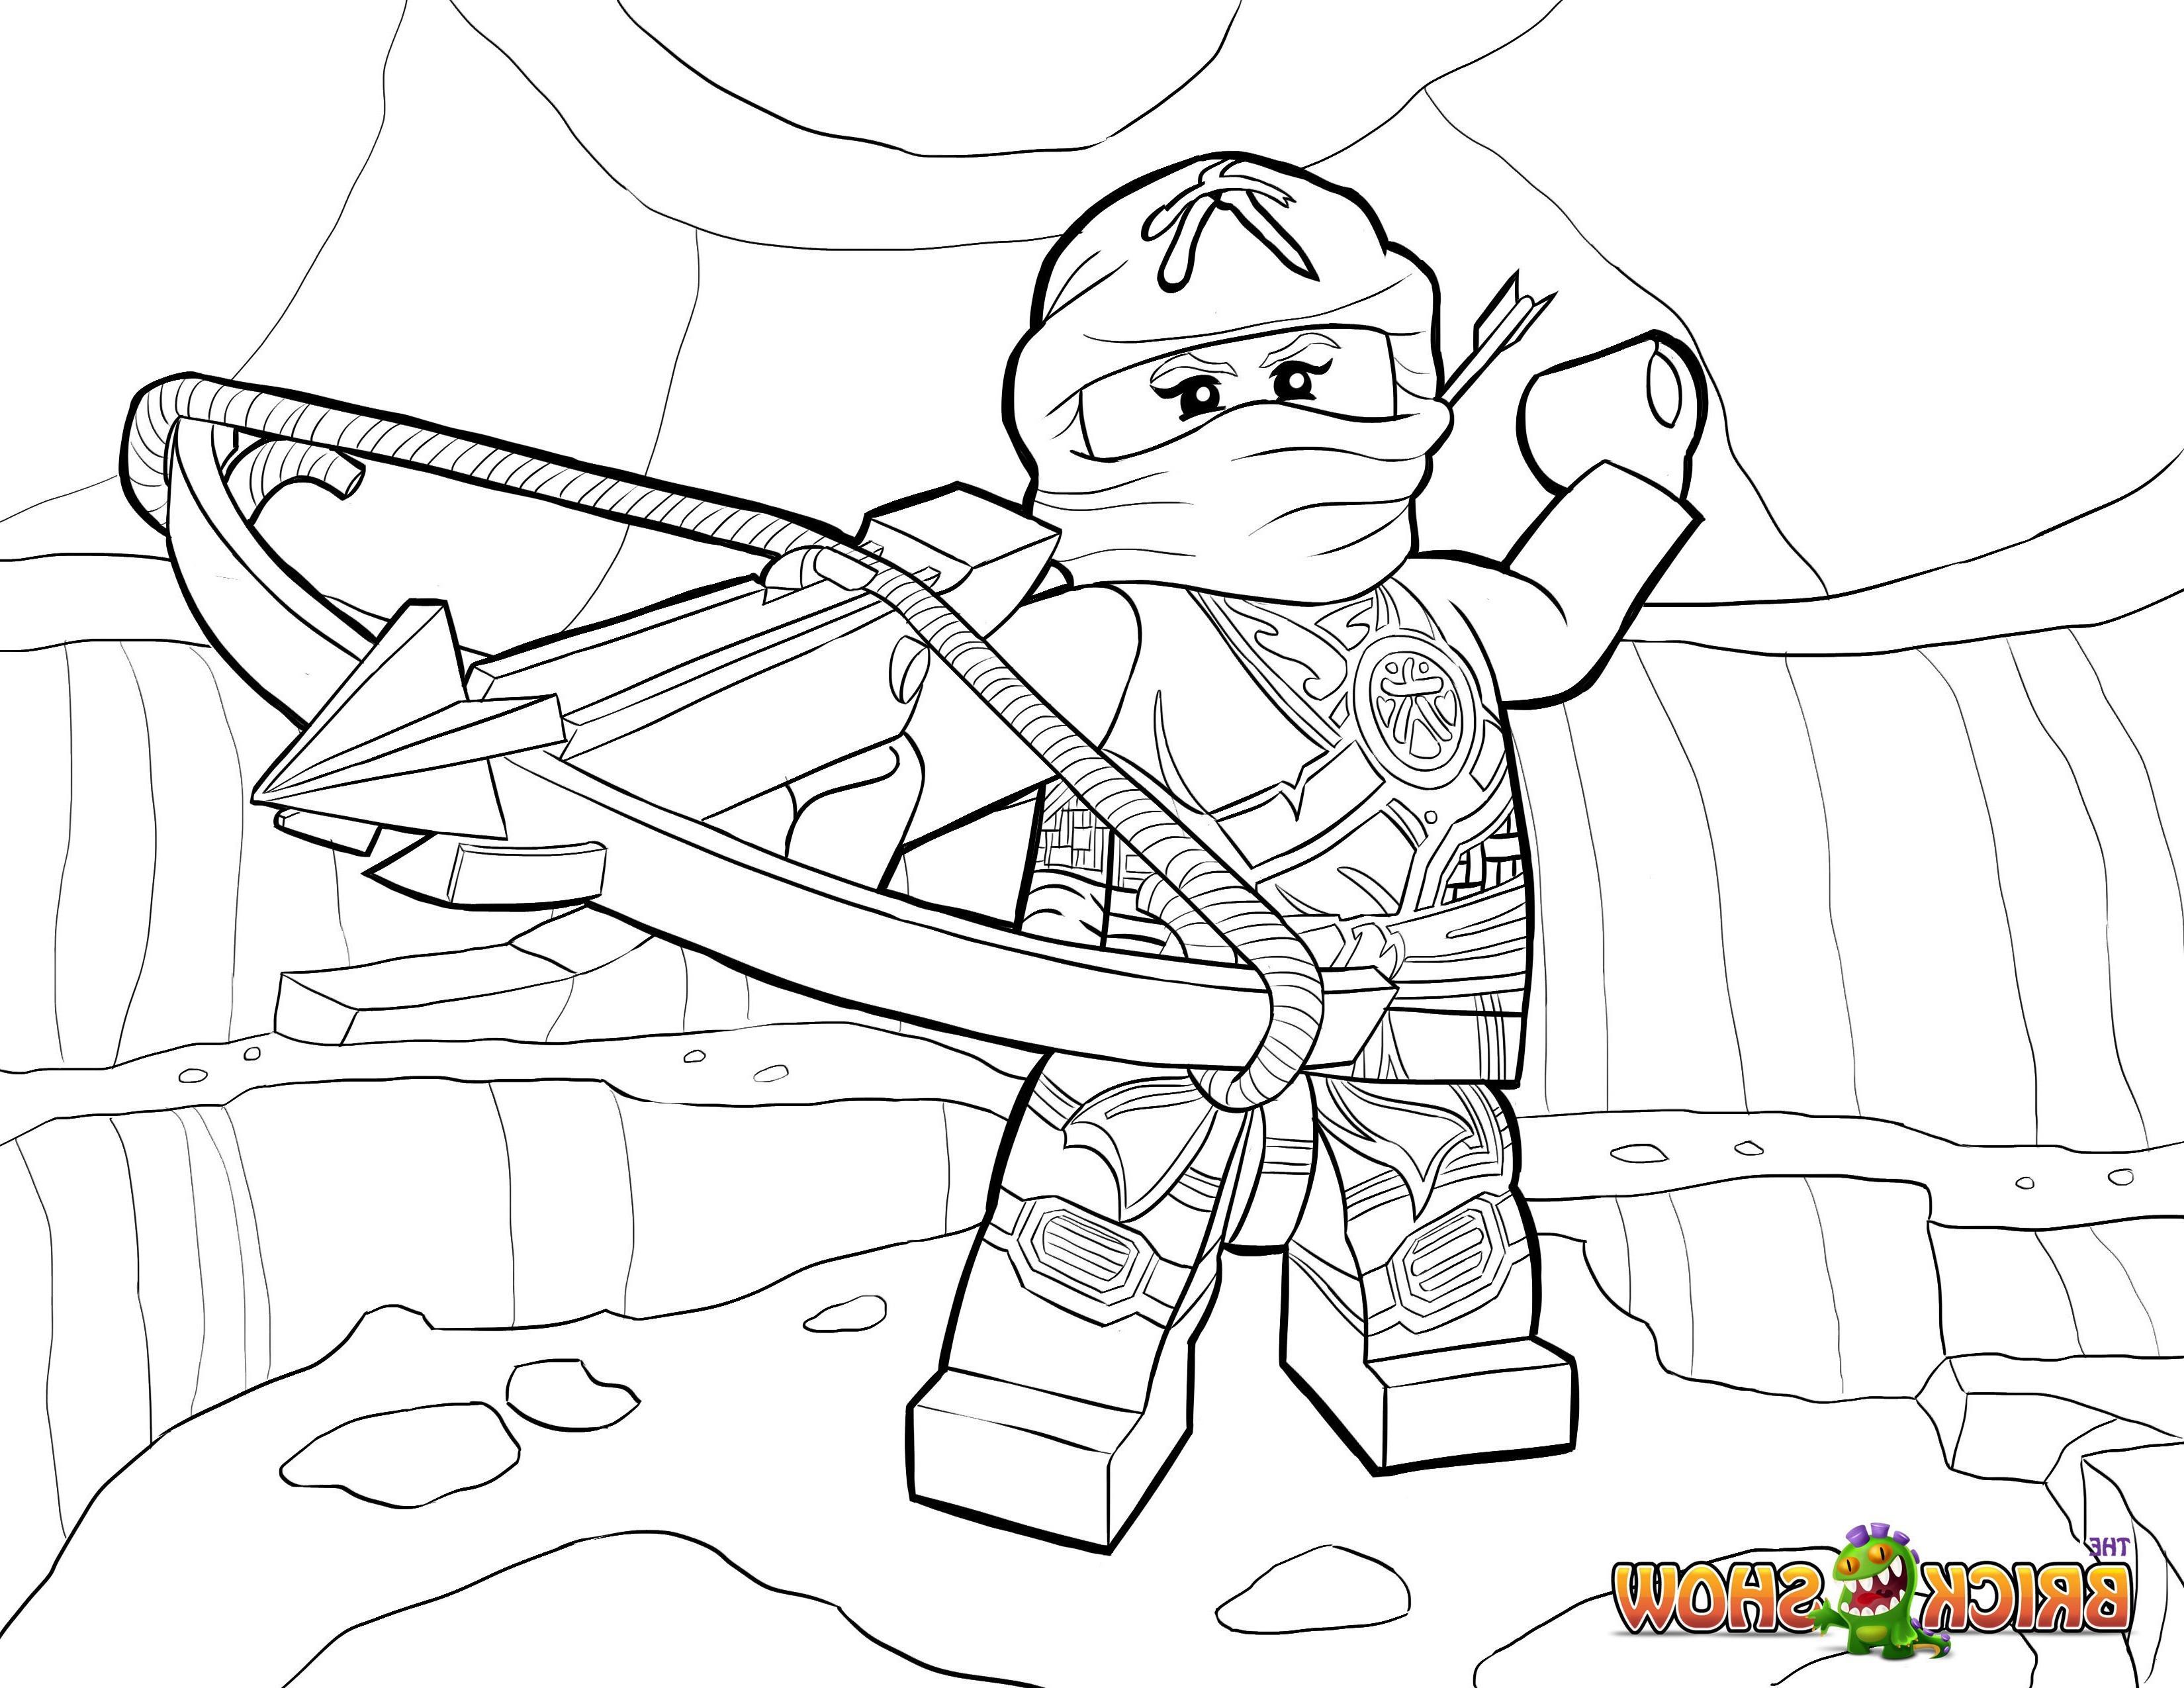 Lego Ninjago Bilder Zum Ausdrucken Frisch 32 Neu Drachen Bilder Zum Ausmalen Und Ausdrucken – Malvorlagen Ideen Galerie